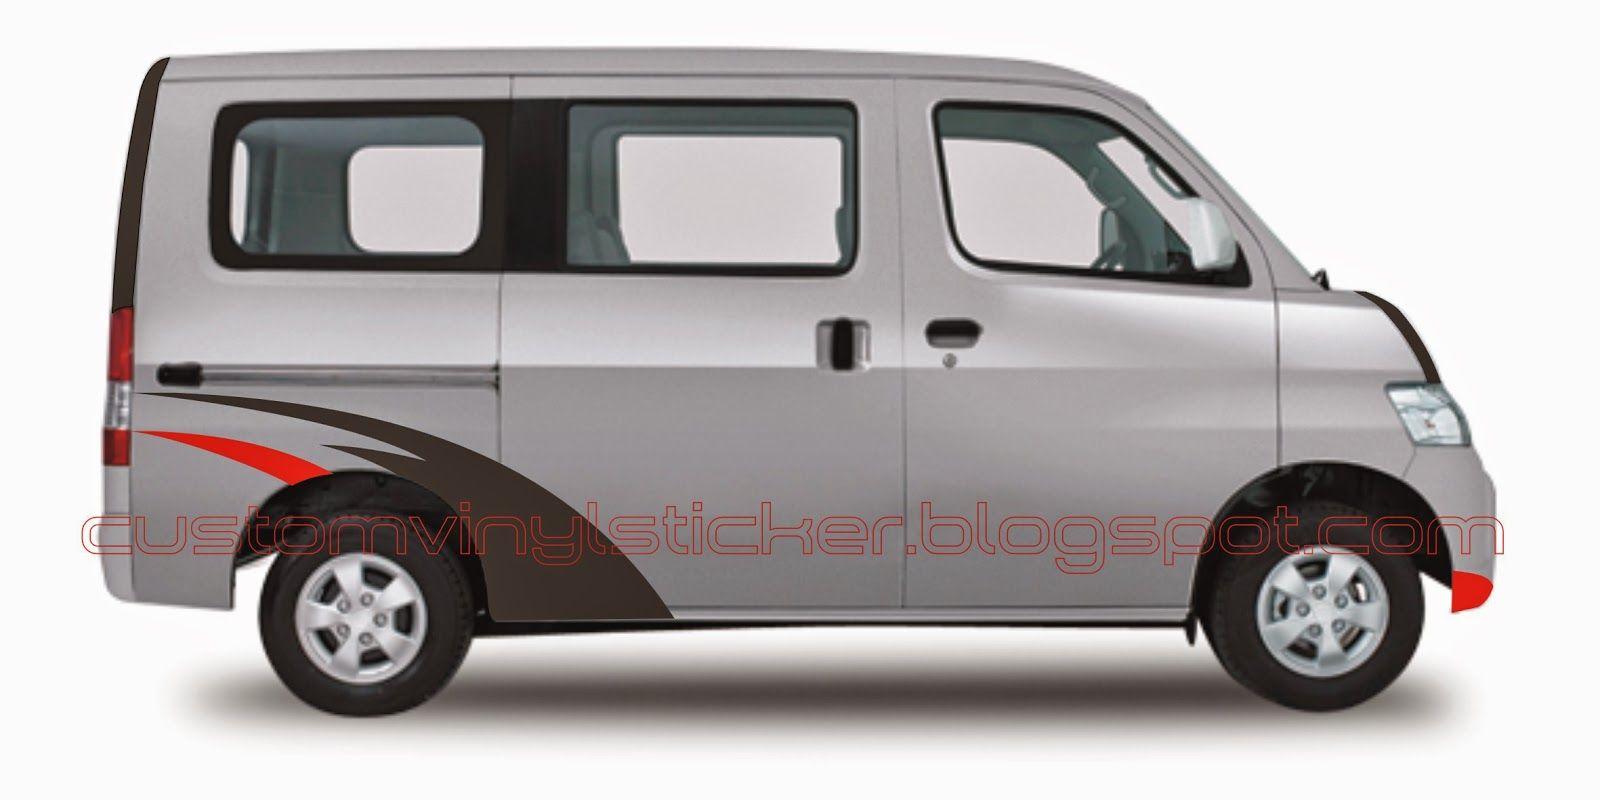 Daihatsu Granmax Silver Wrap Strip Concept Dengan Gambar